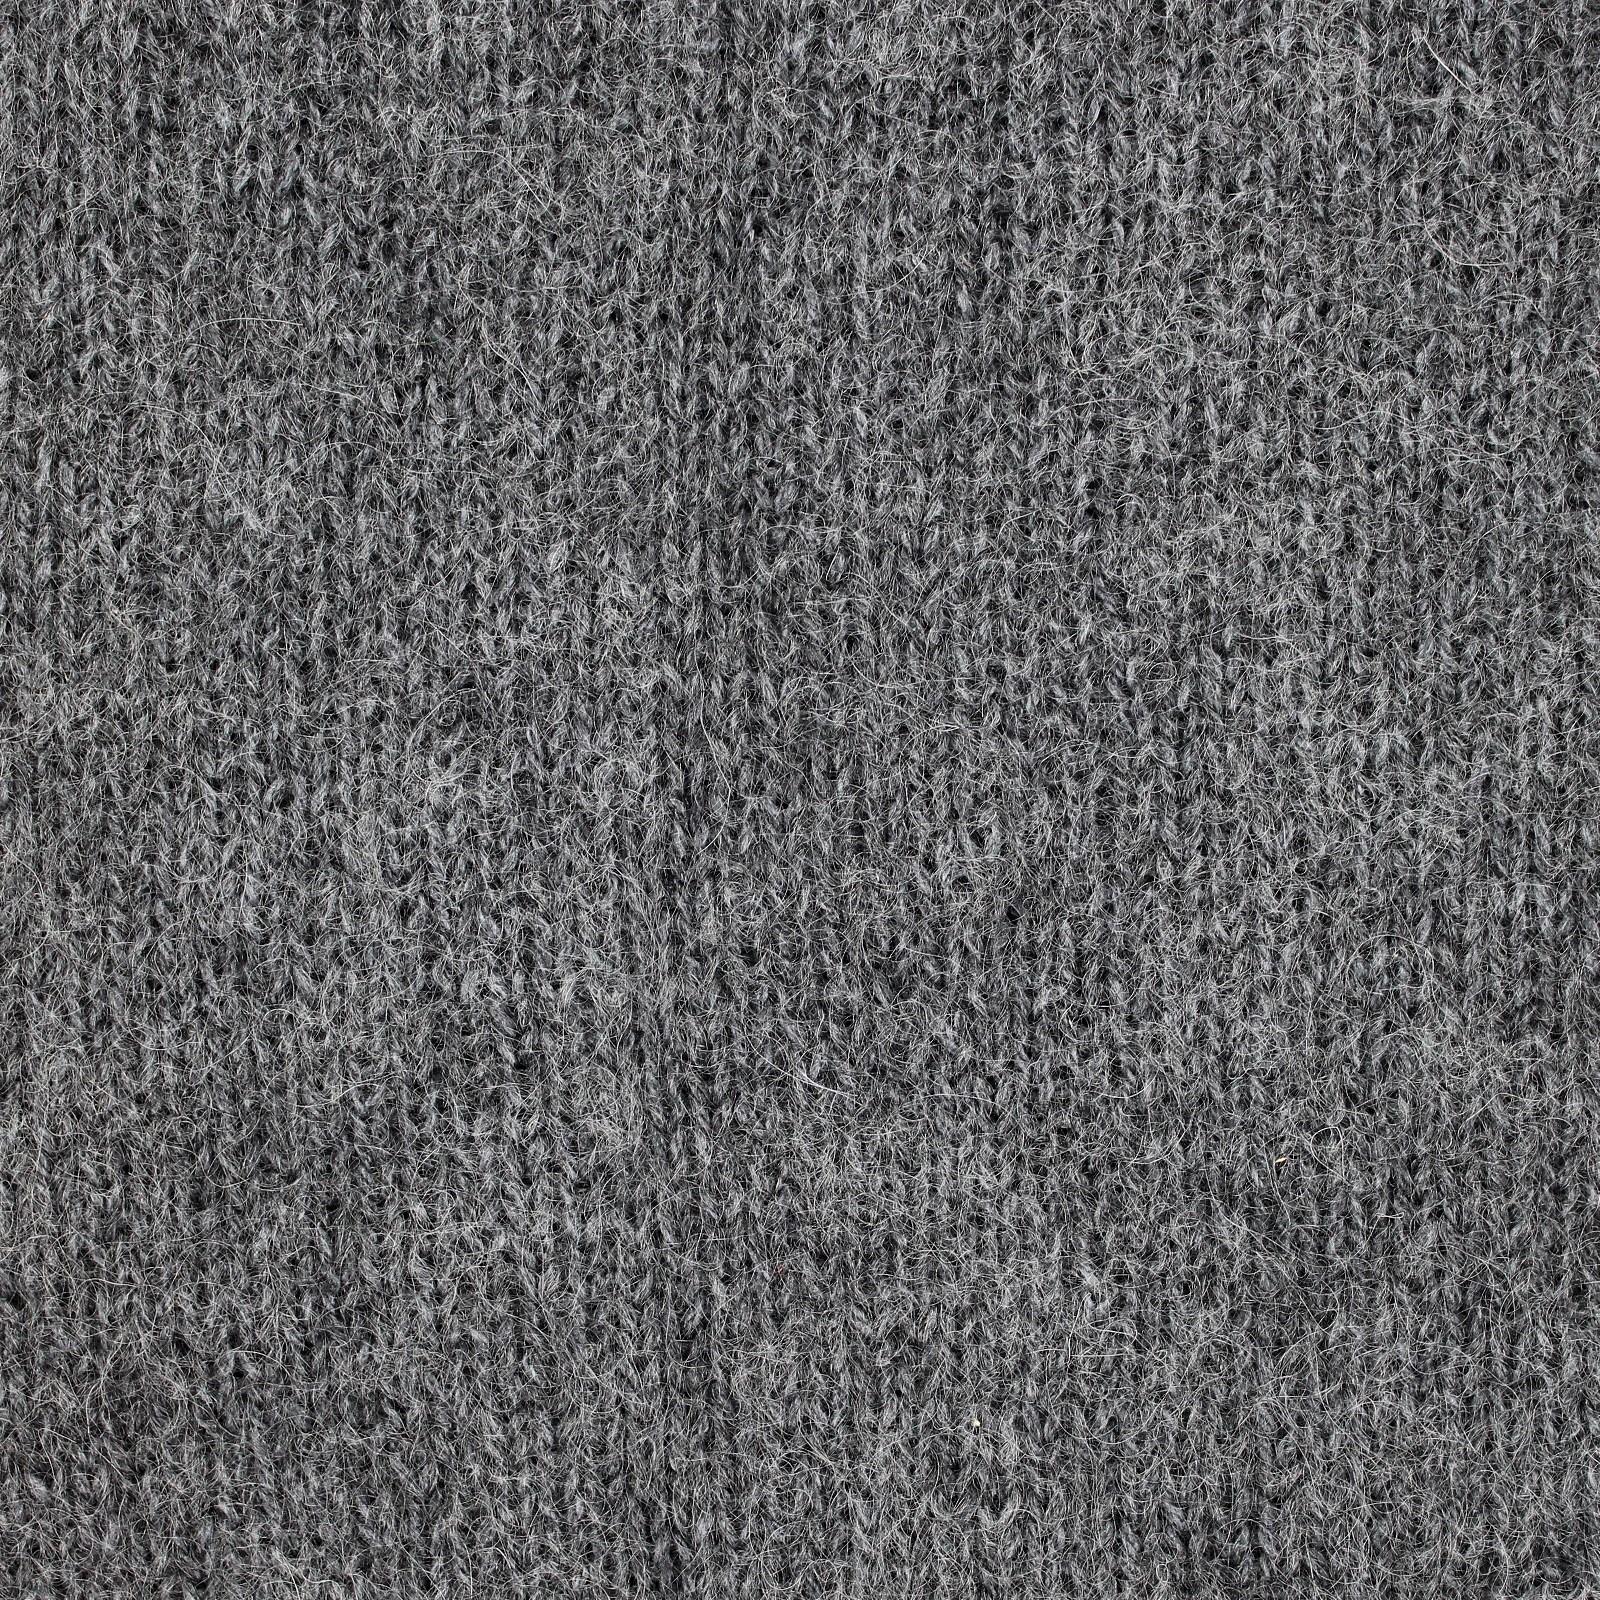 Mohair editon 4eren garn i dark grey